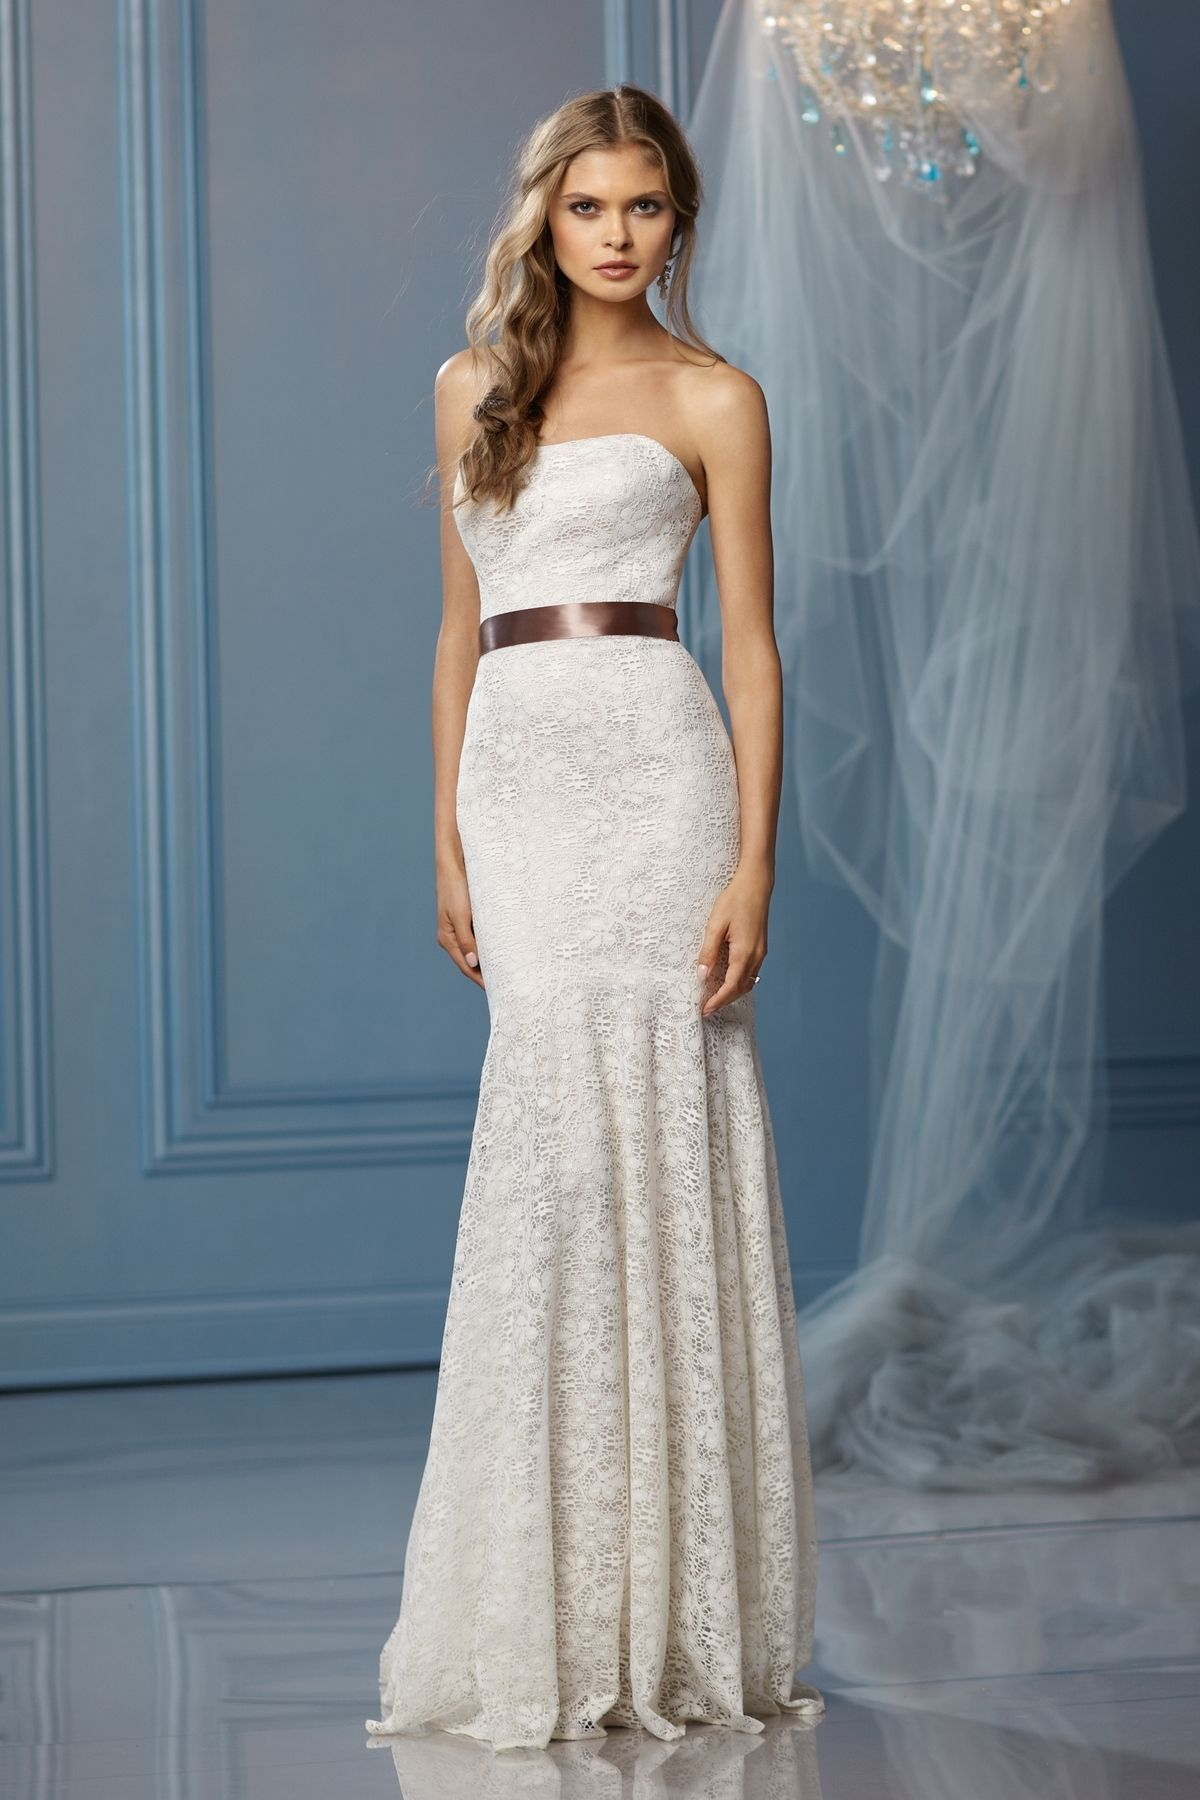 Beautiful Fantasy Wedding Dresses Elaboration - All Wedding Dresses ...